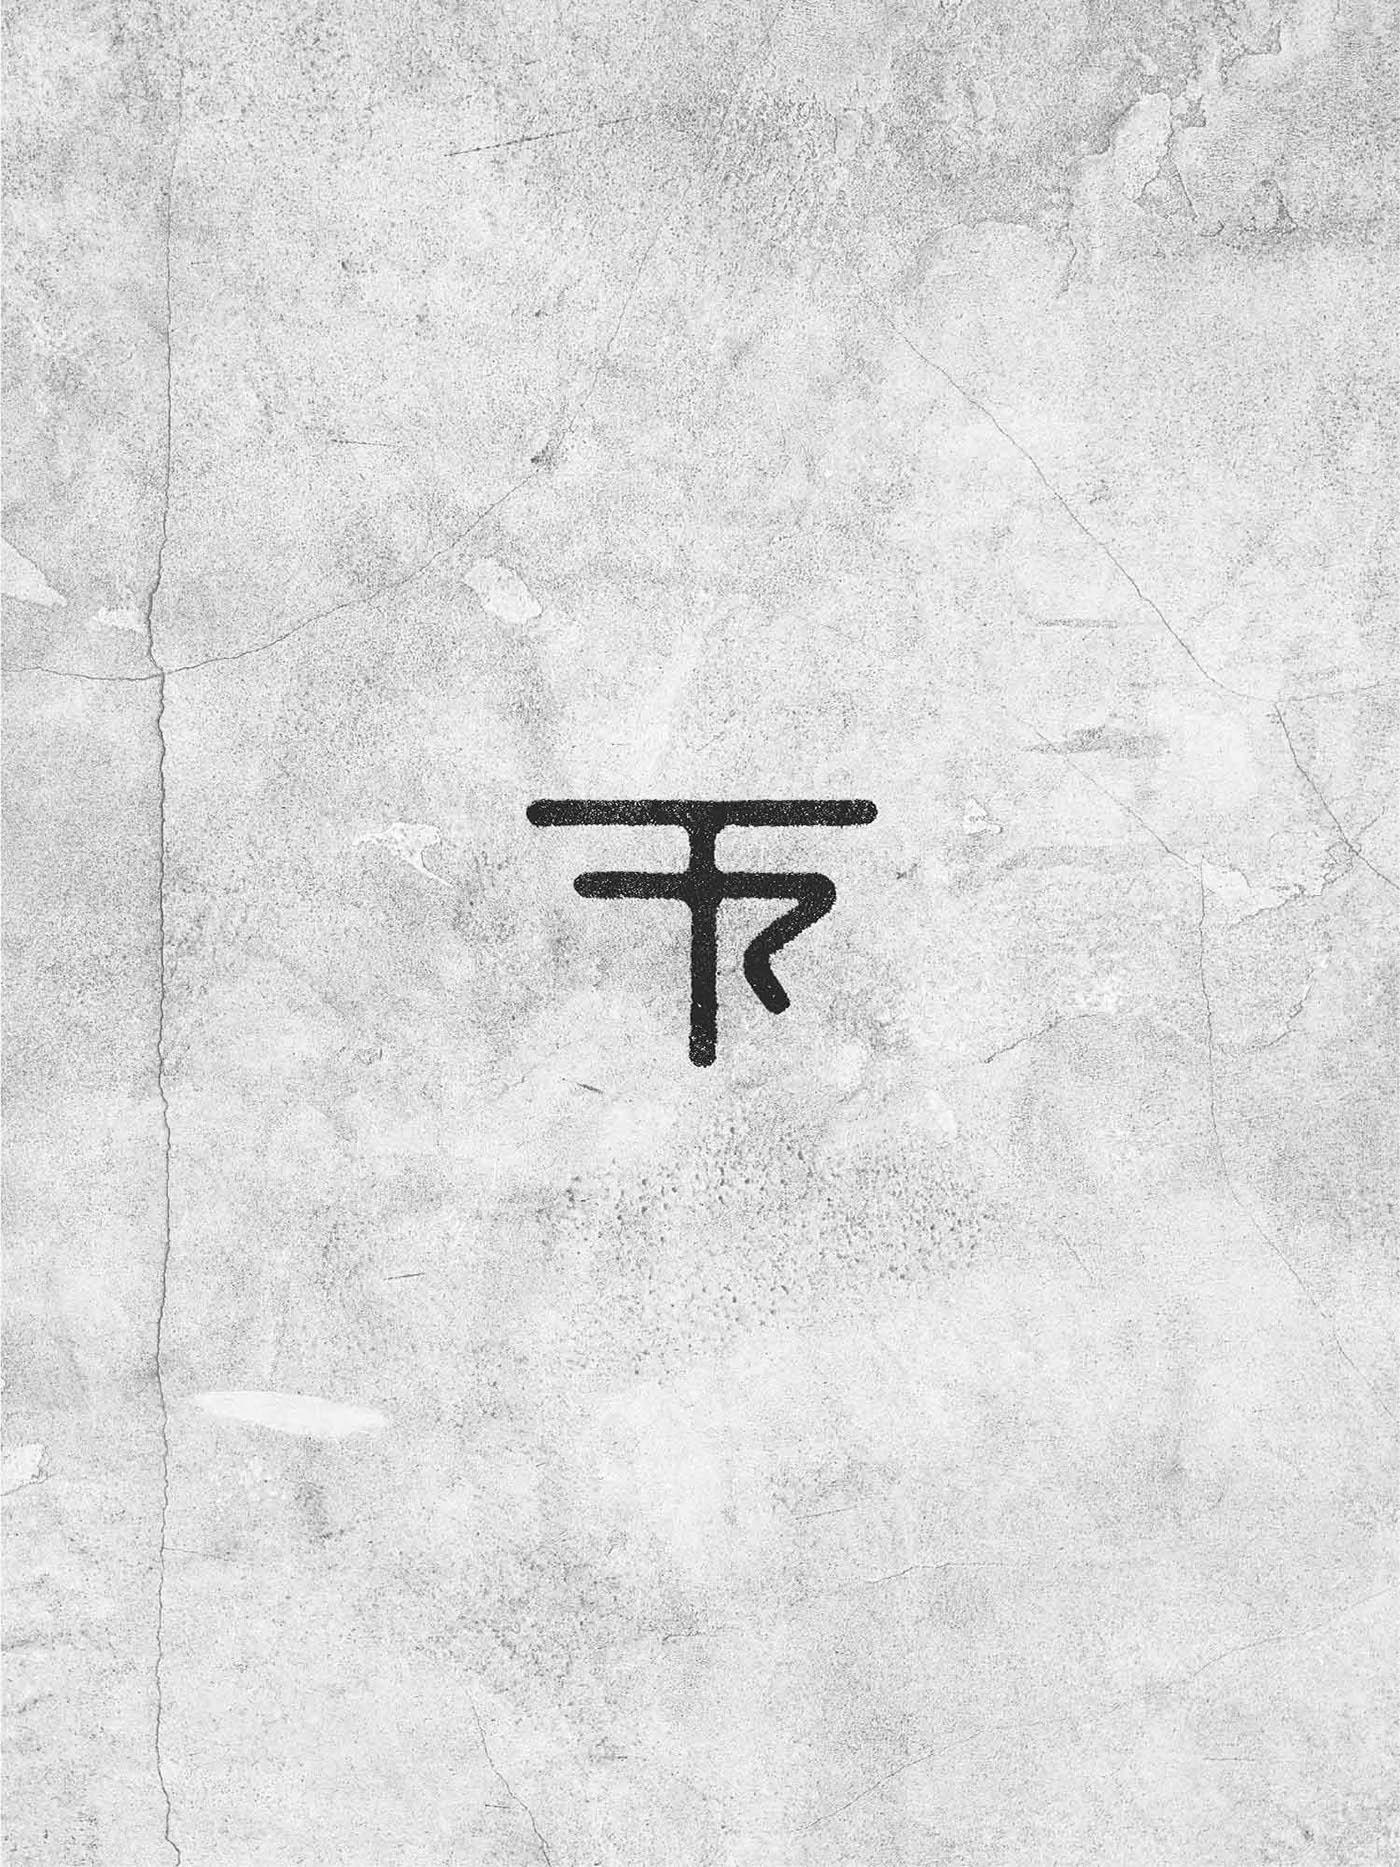 Paul Stancel Logo Design branding  brand identity monogram simple minimalist minimal bold Ftr